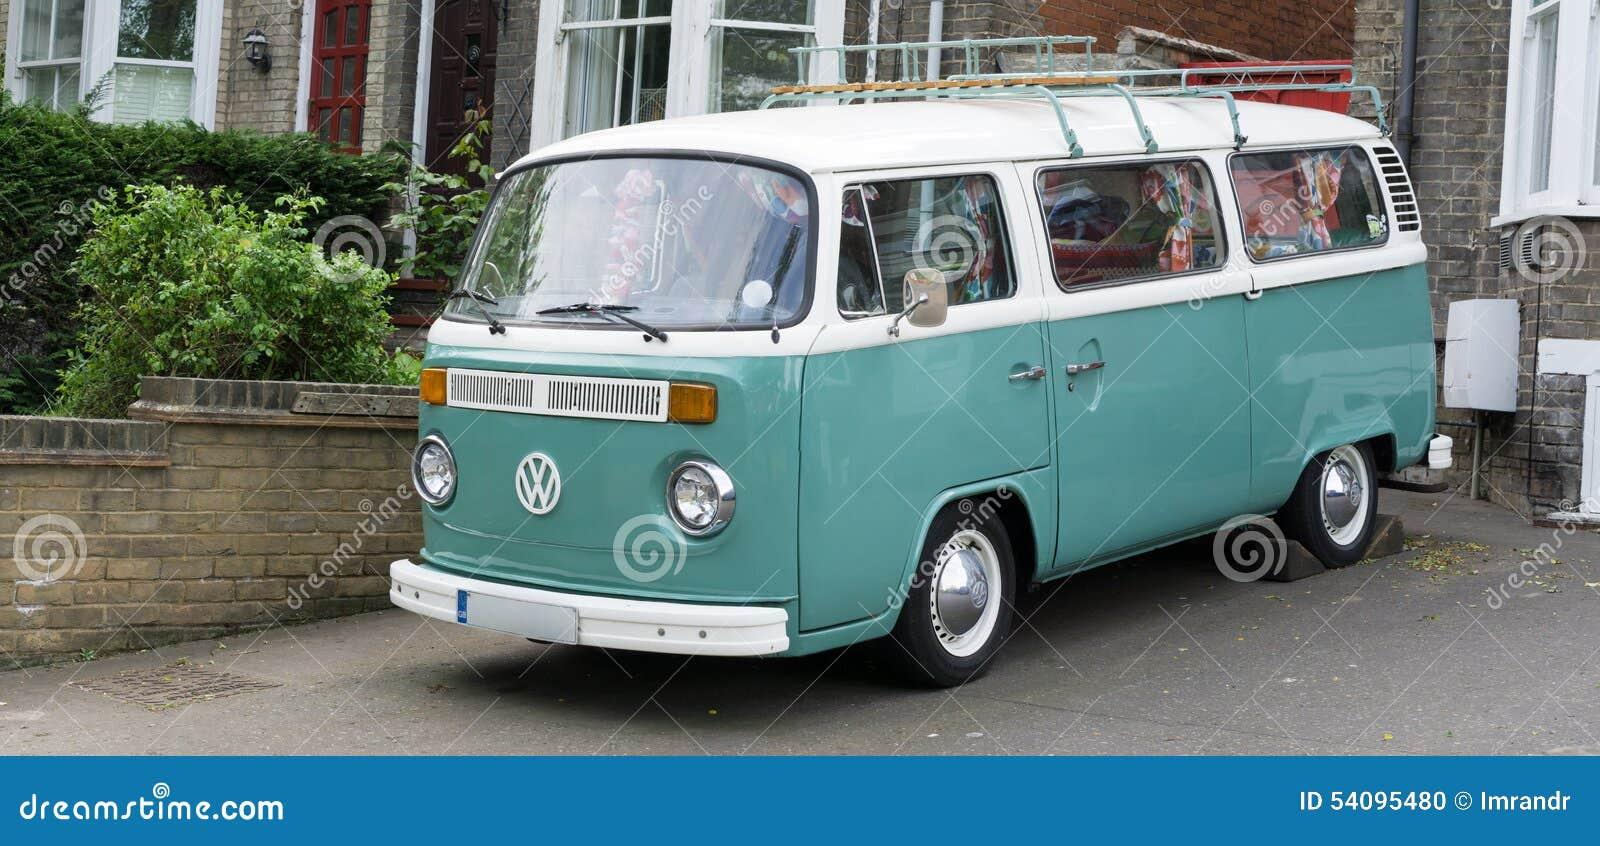 529 best Vintage VW Camper Vans